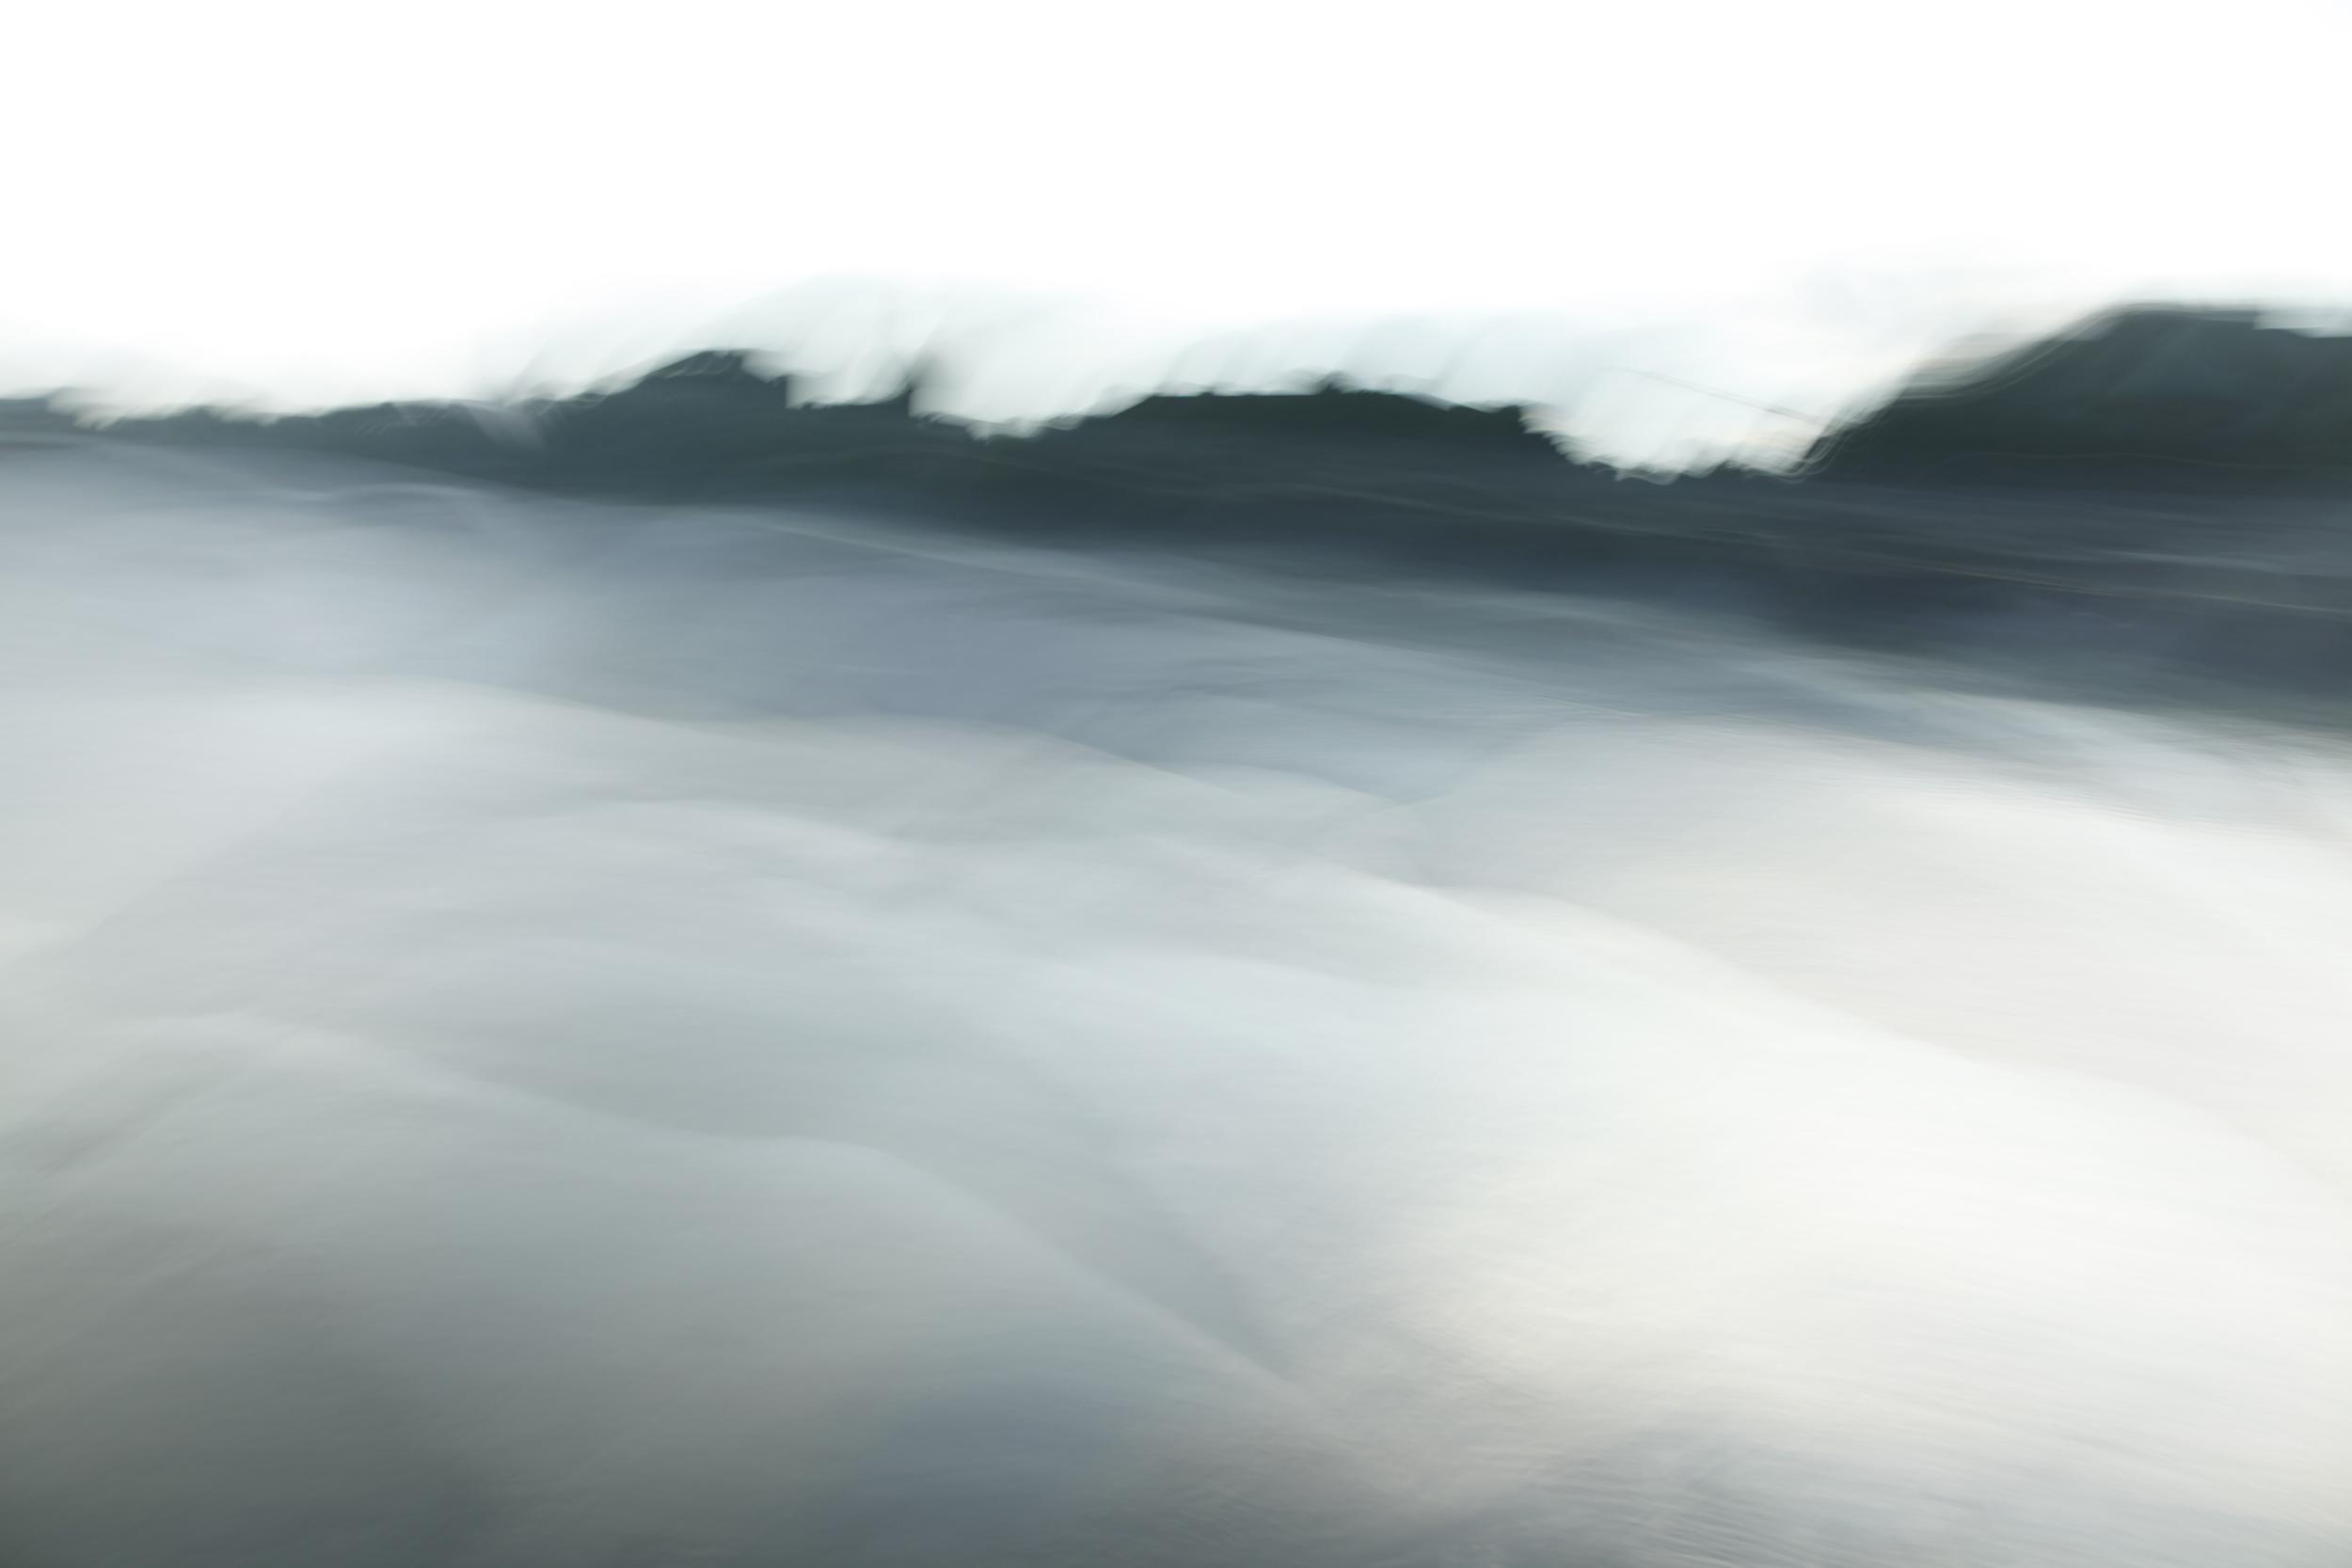 Abstract_09.JPG